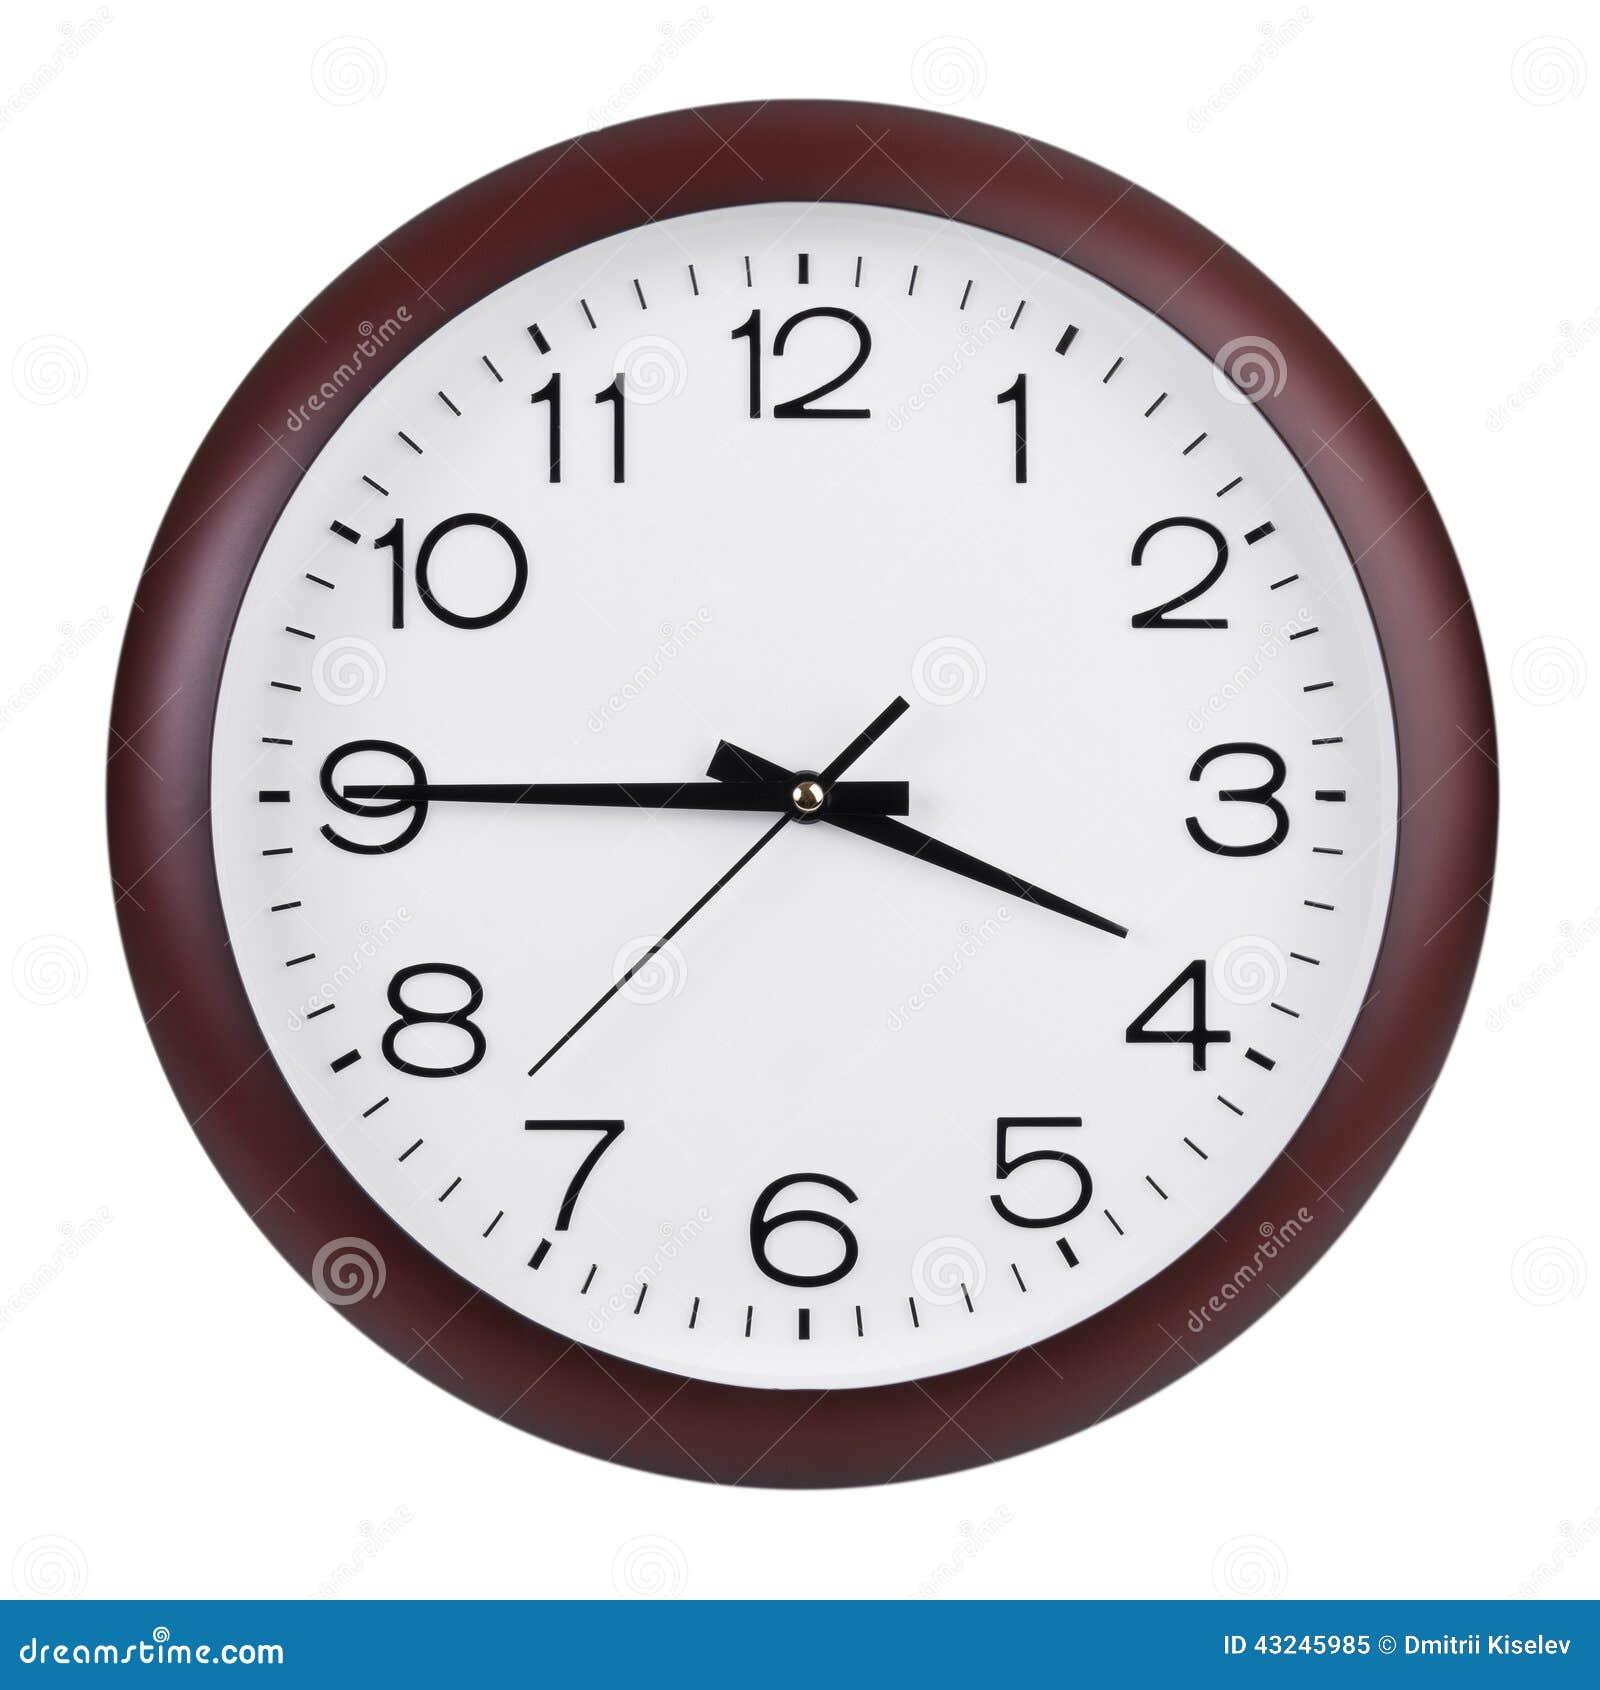 quarter to four o 39 clock stock image image of hour watch 43245985. Black Bedroom Furniture Sets. Home Design Ideas